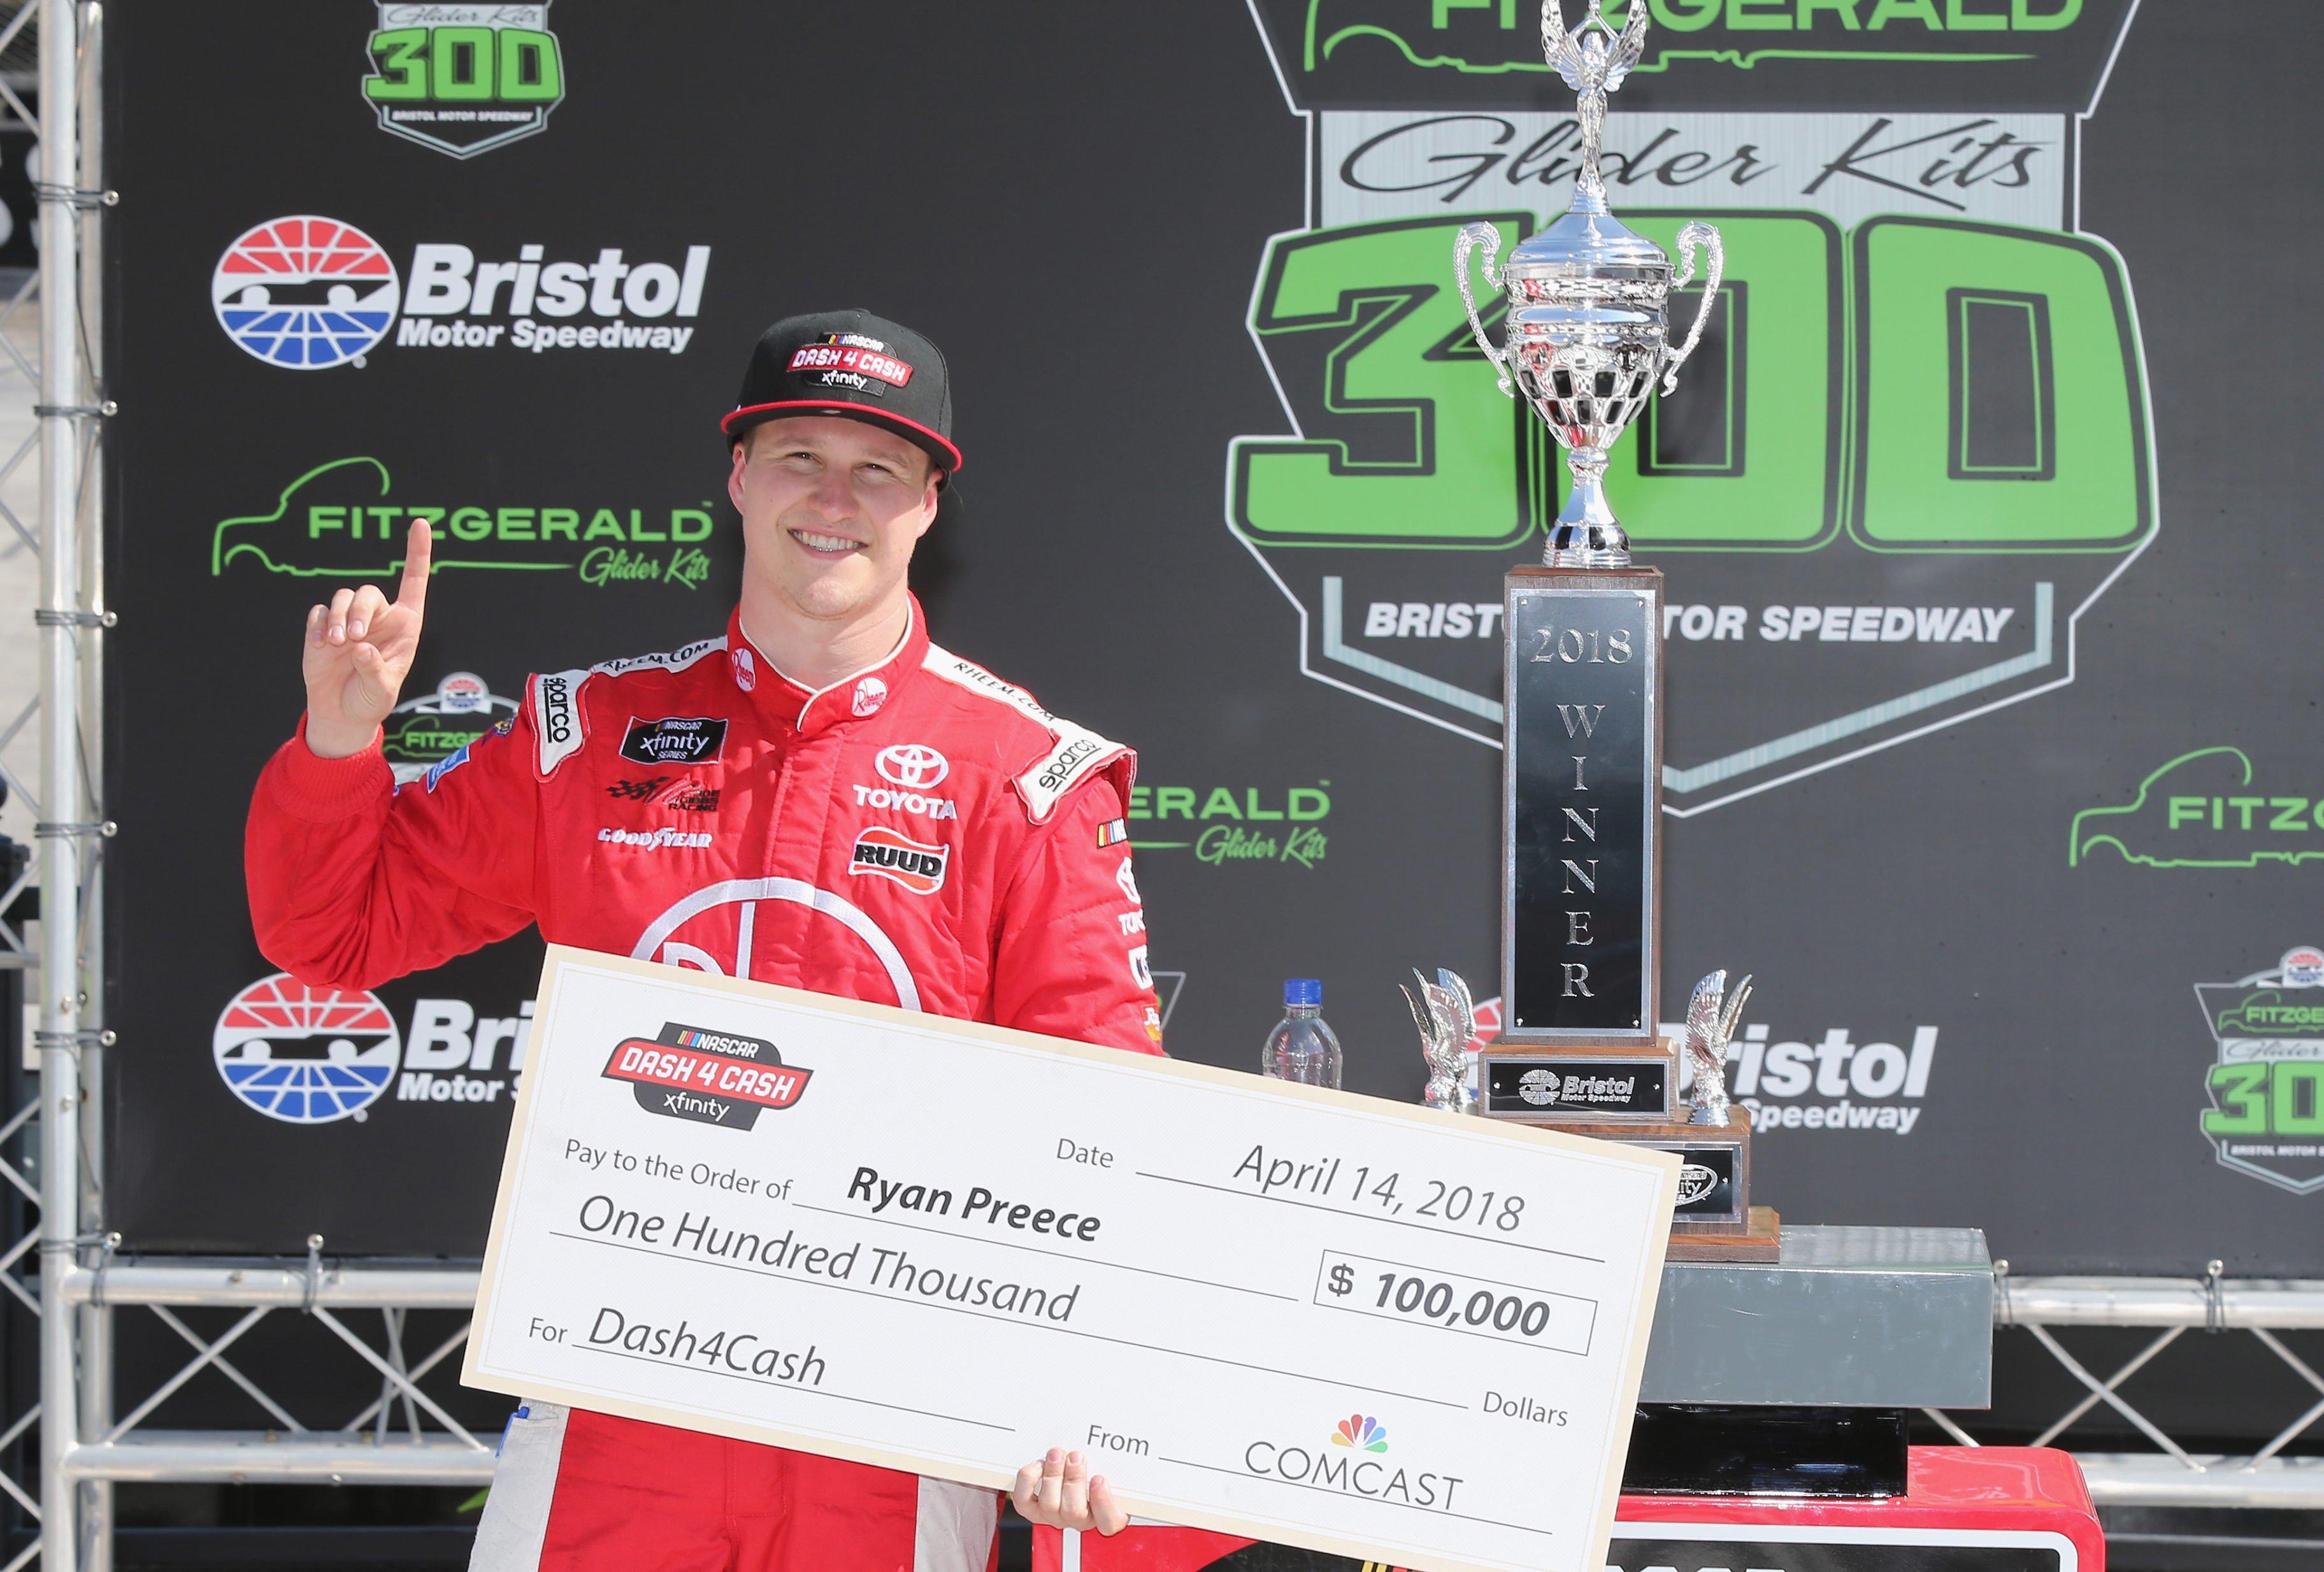 Ryan Preece wins the Dash for Cash at Bristol Motor Speedway